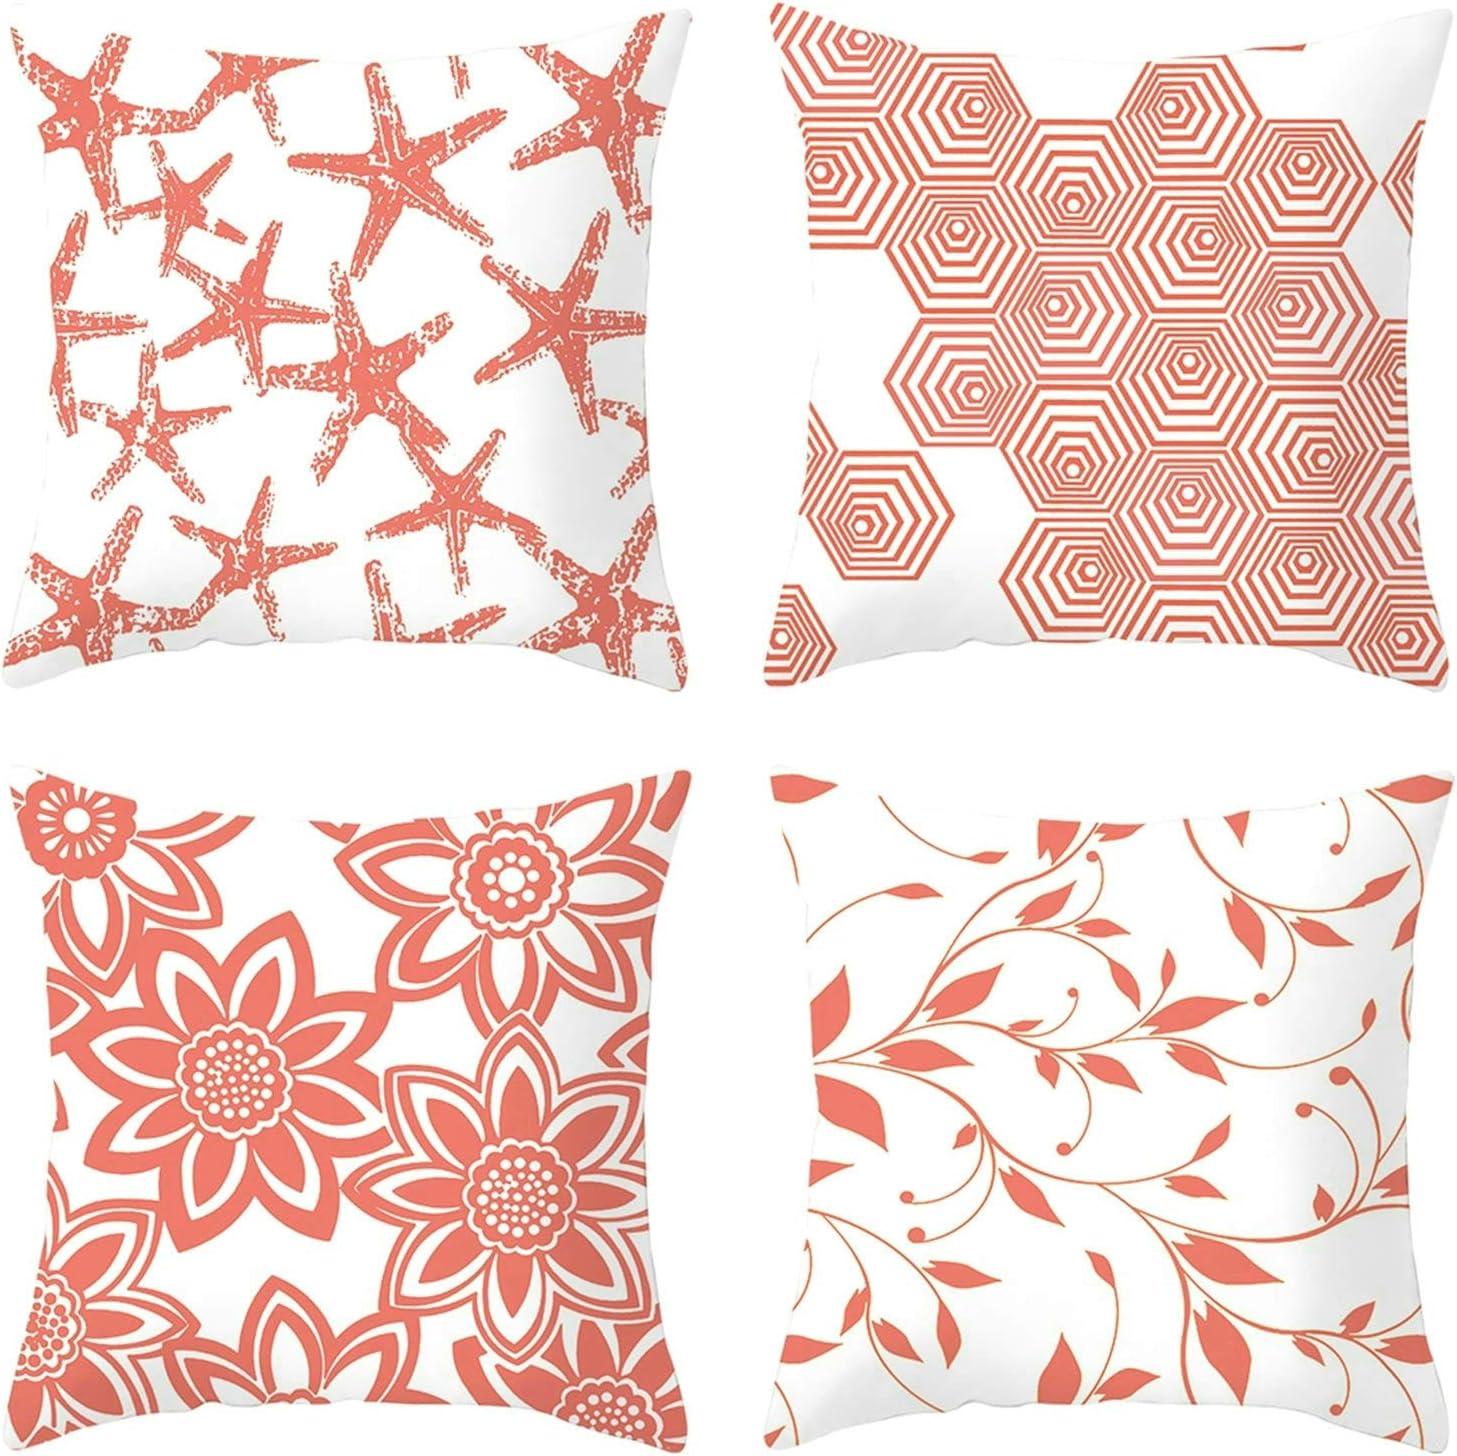 Socoz Juego de 4 fundas de cojín para sofá, 45 x 45 cm, fundas de cojín para sofá rectangulares con estrella marina, flor de mar